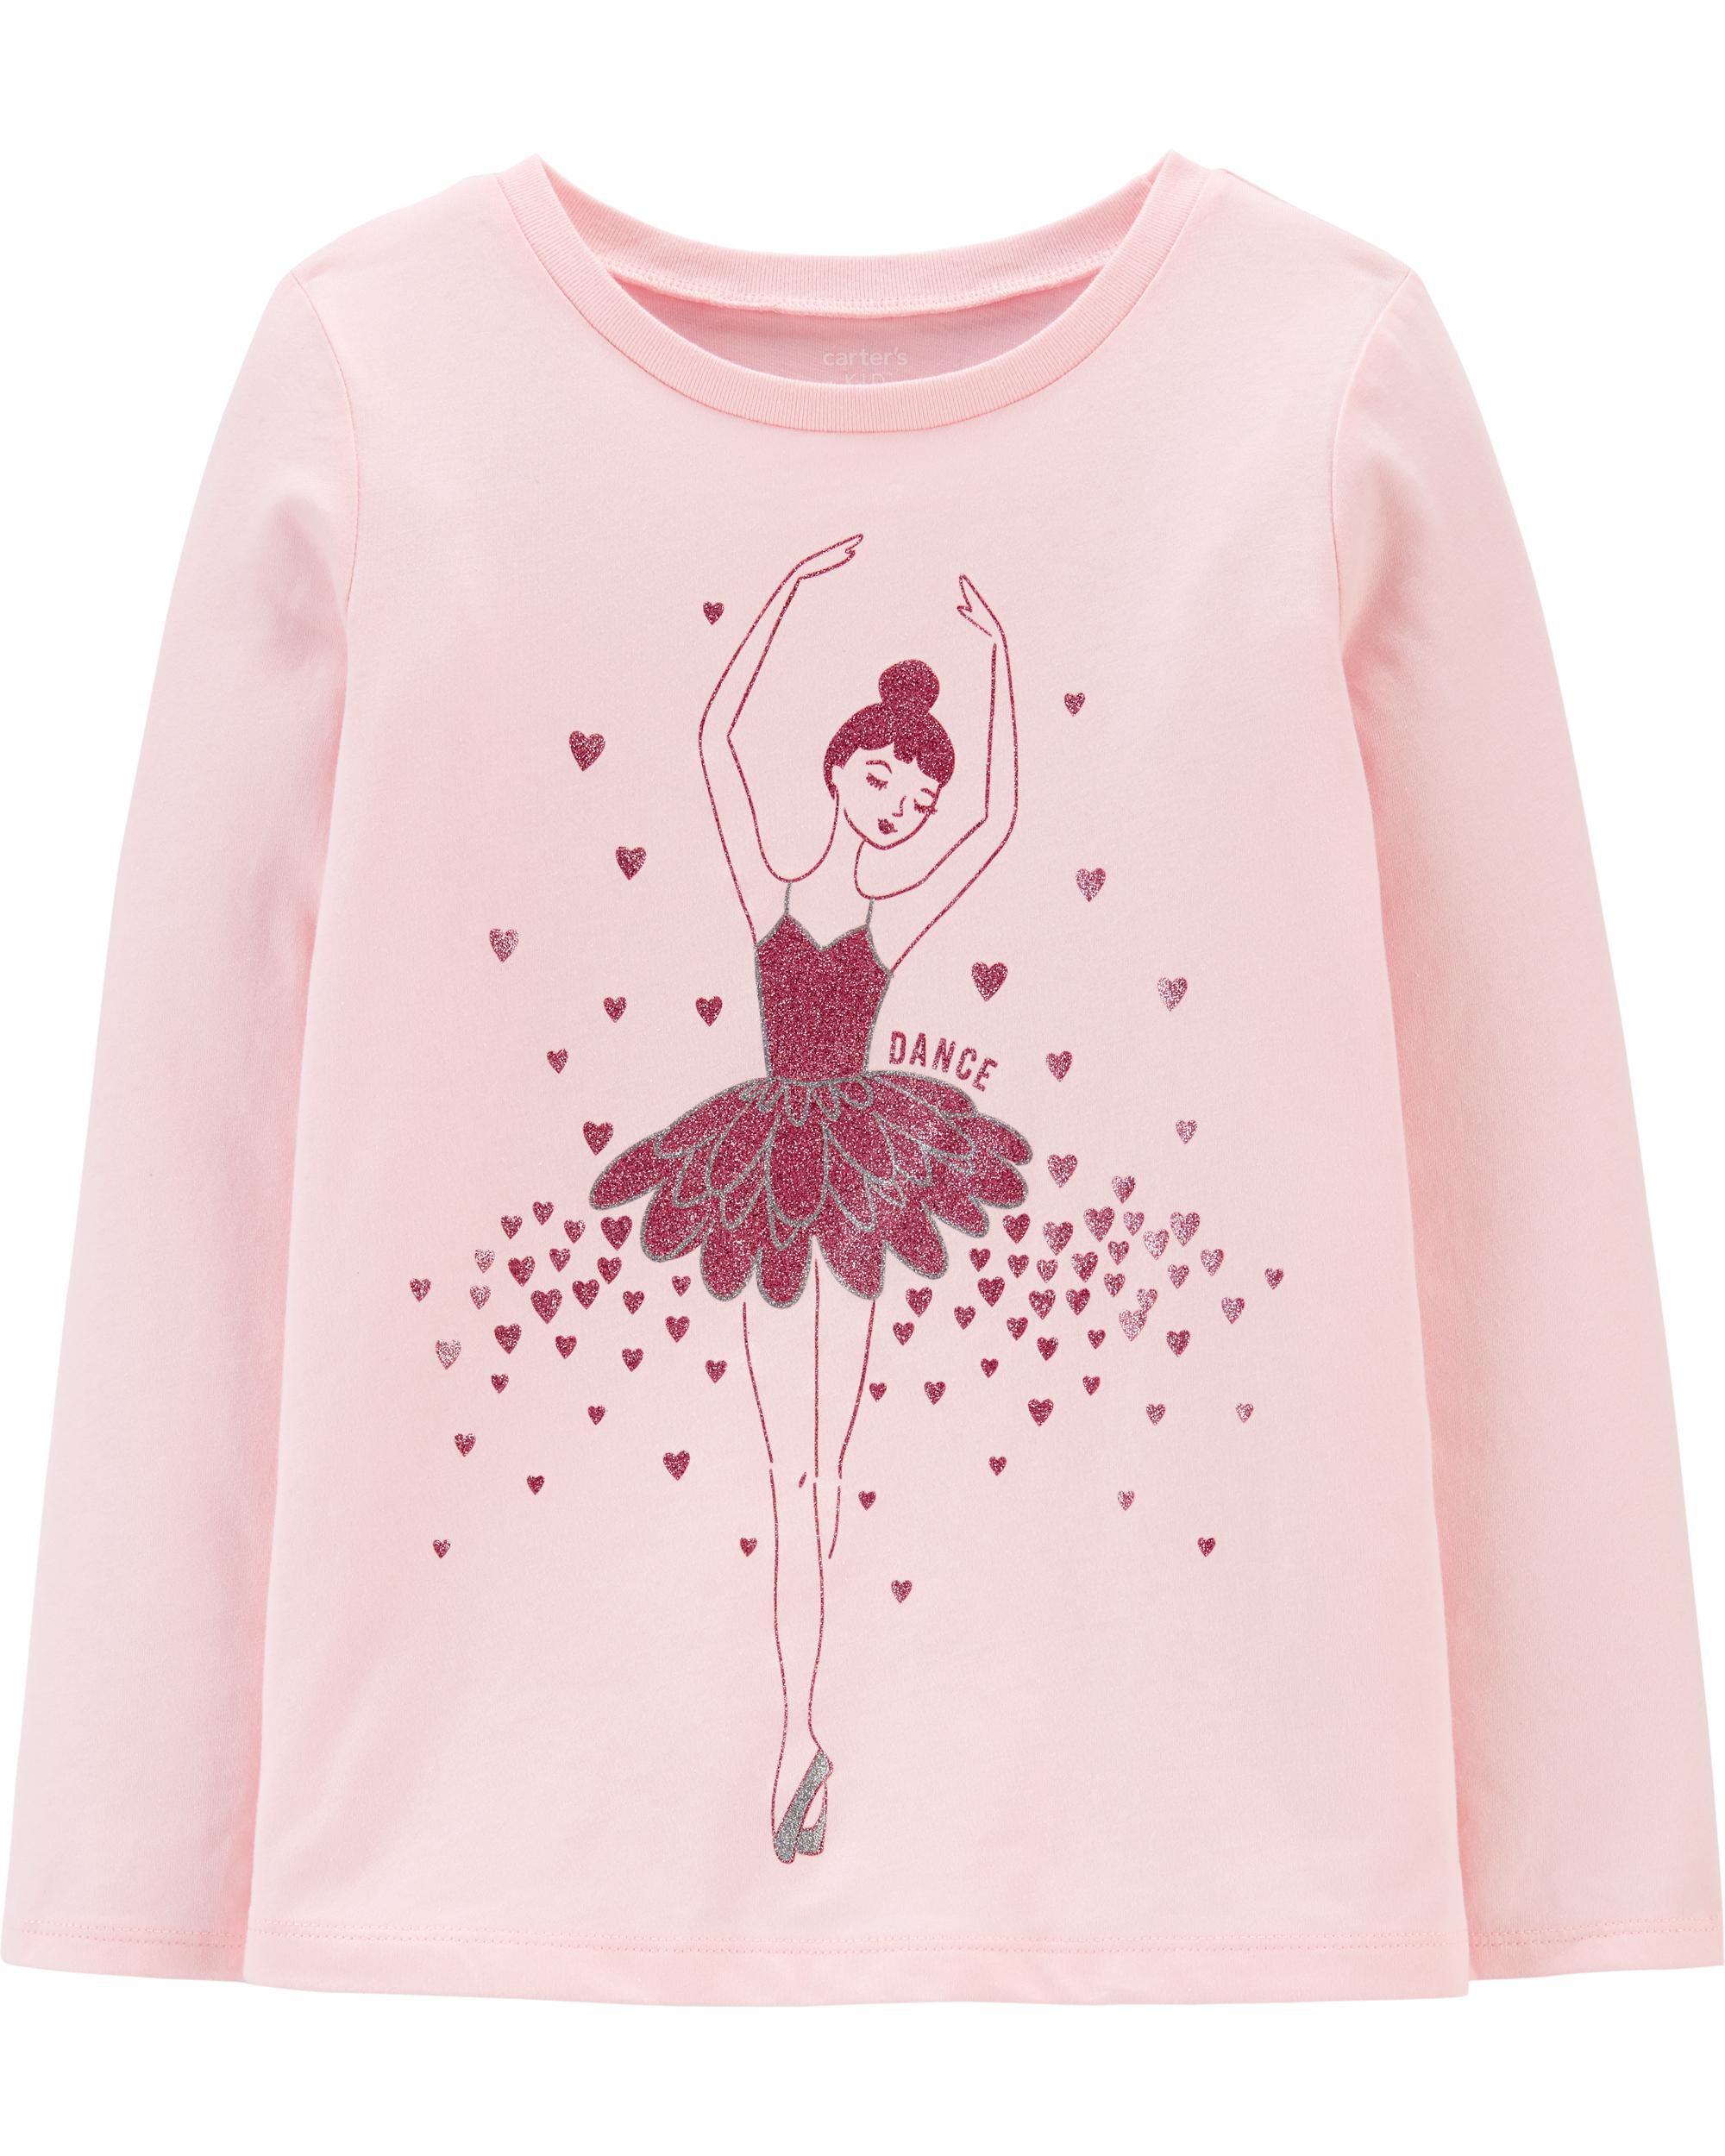 *DOORBUSTER* Glitter Ballerina Jersey Tee